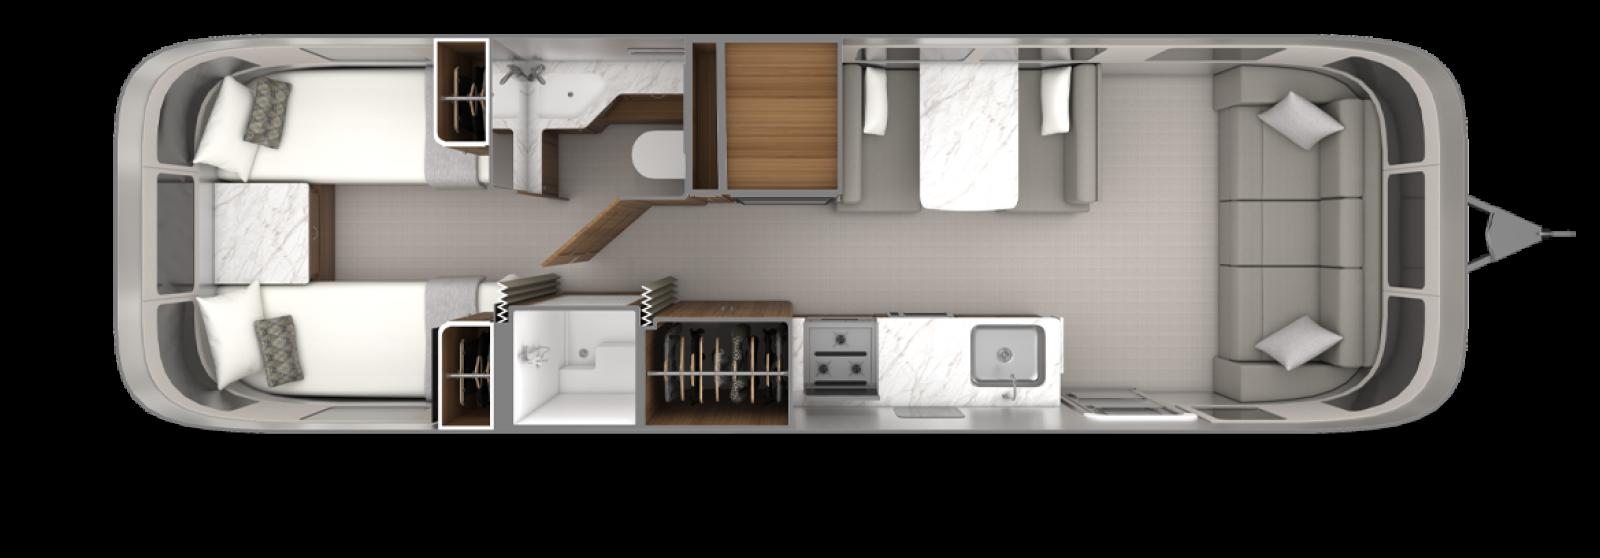 2022_Classic30RB_Floorplan_EstateBrown_EarlGrey_Twin